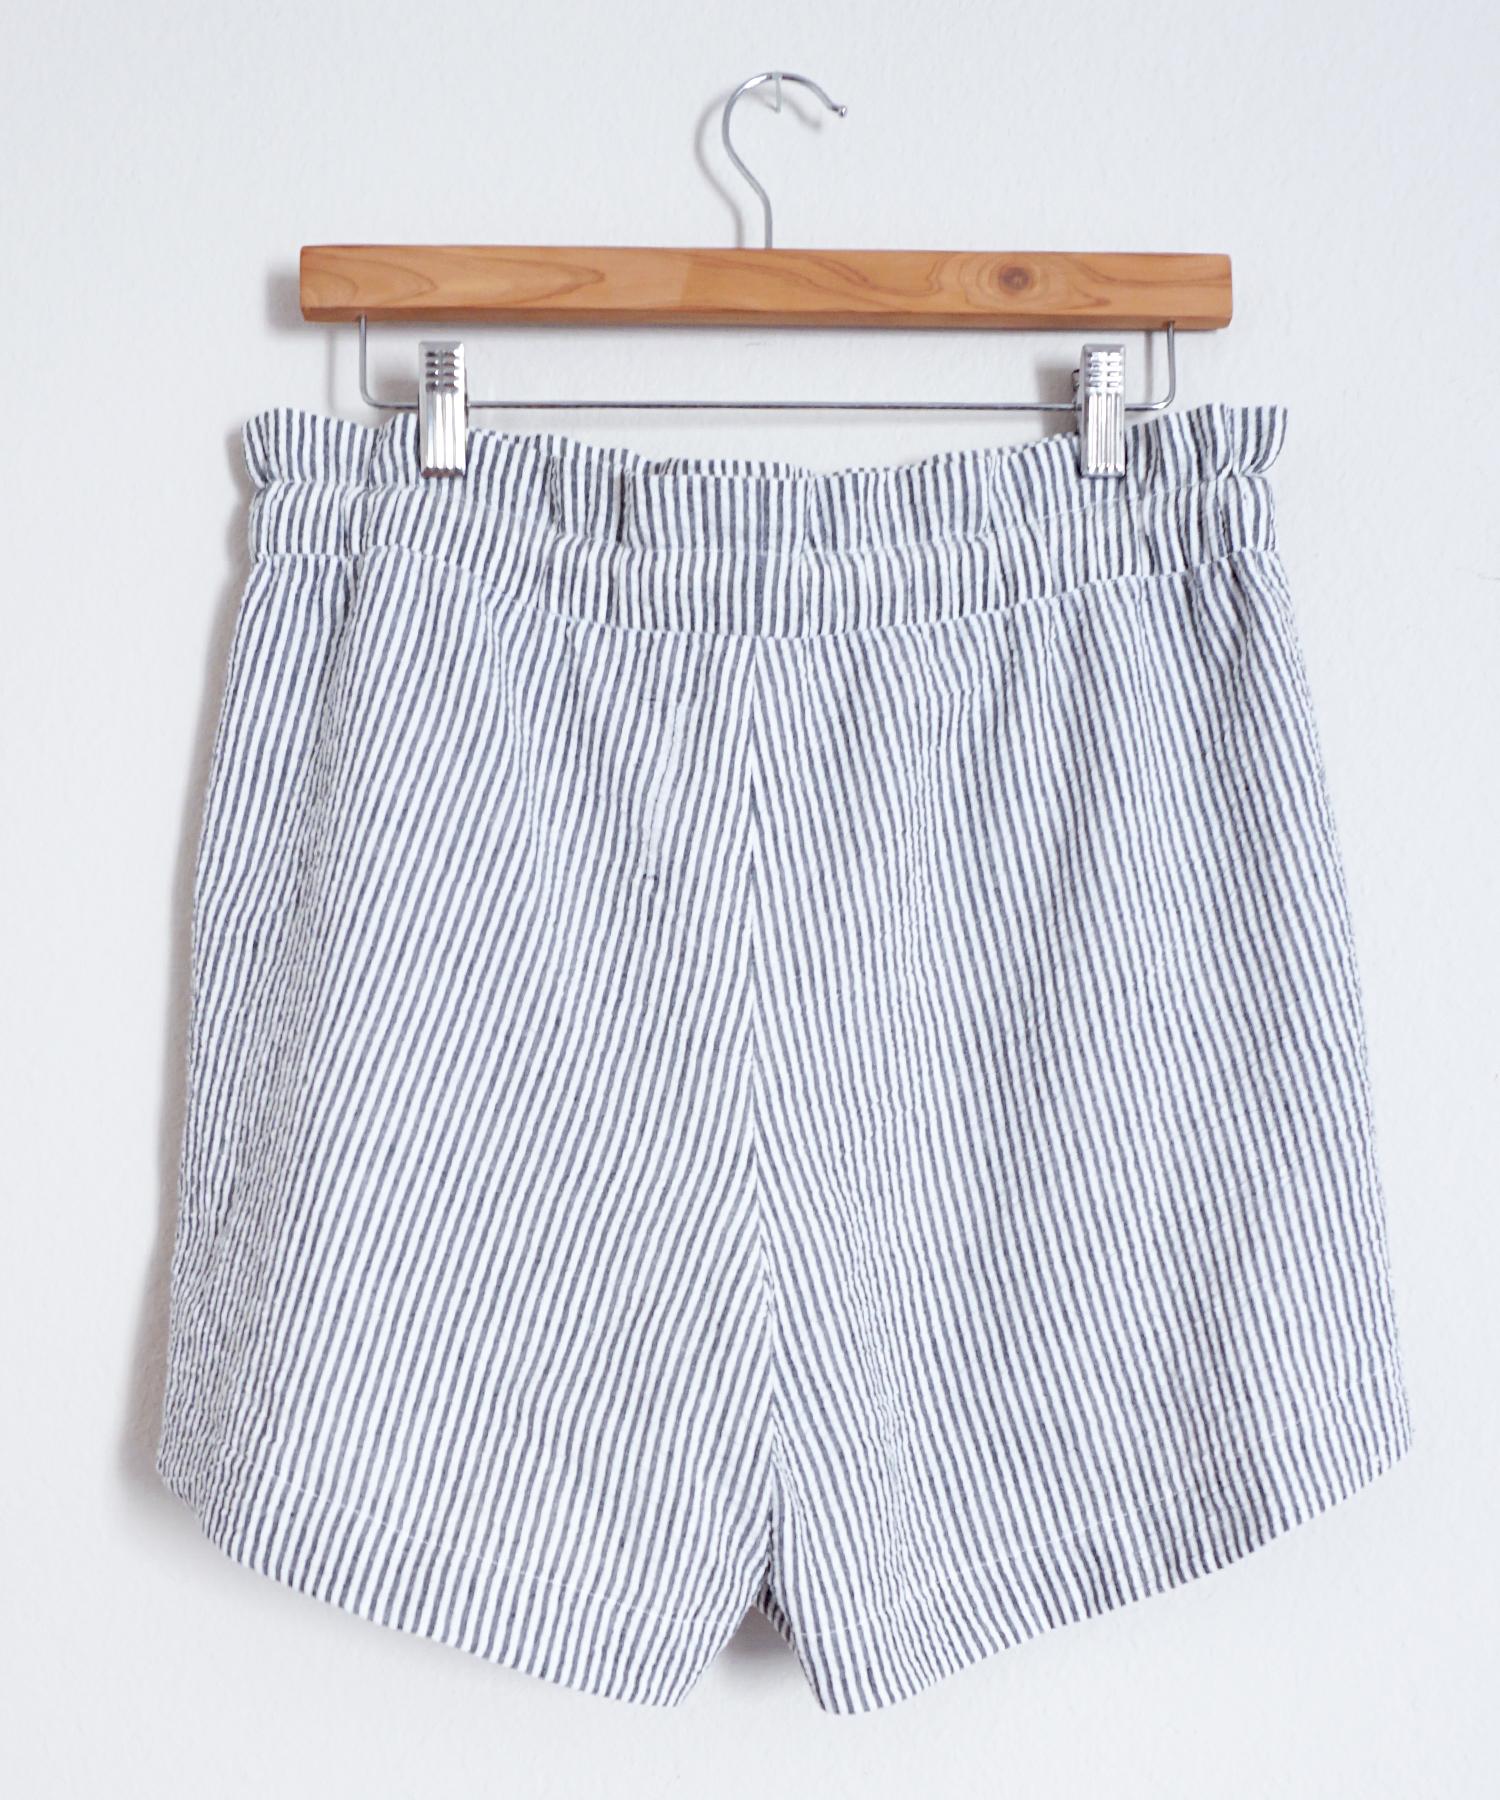 DIY Seersucker Spring Shorts | Sew DIY